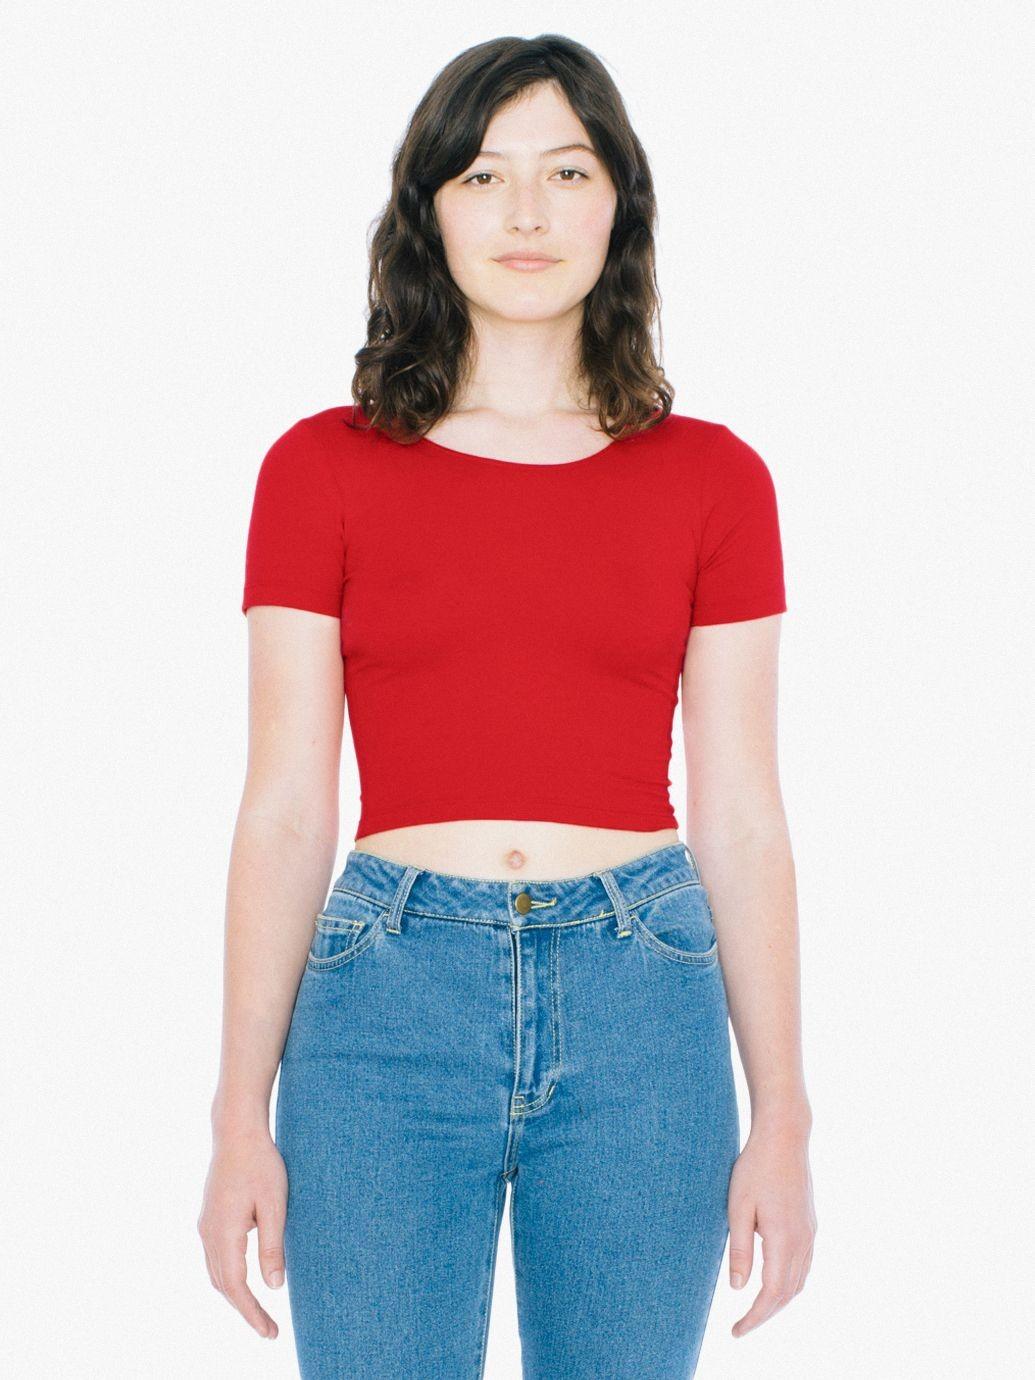 2 Pallets of Ladies' American Apparel Crop Tops, Leggings, Disco Pants & More, 1 Ext. Retail $40,152, Mira Loma, CA